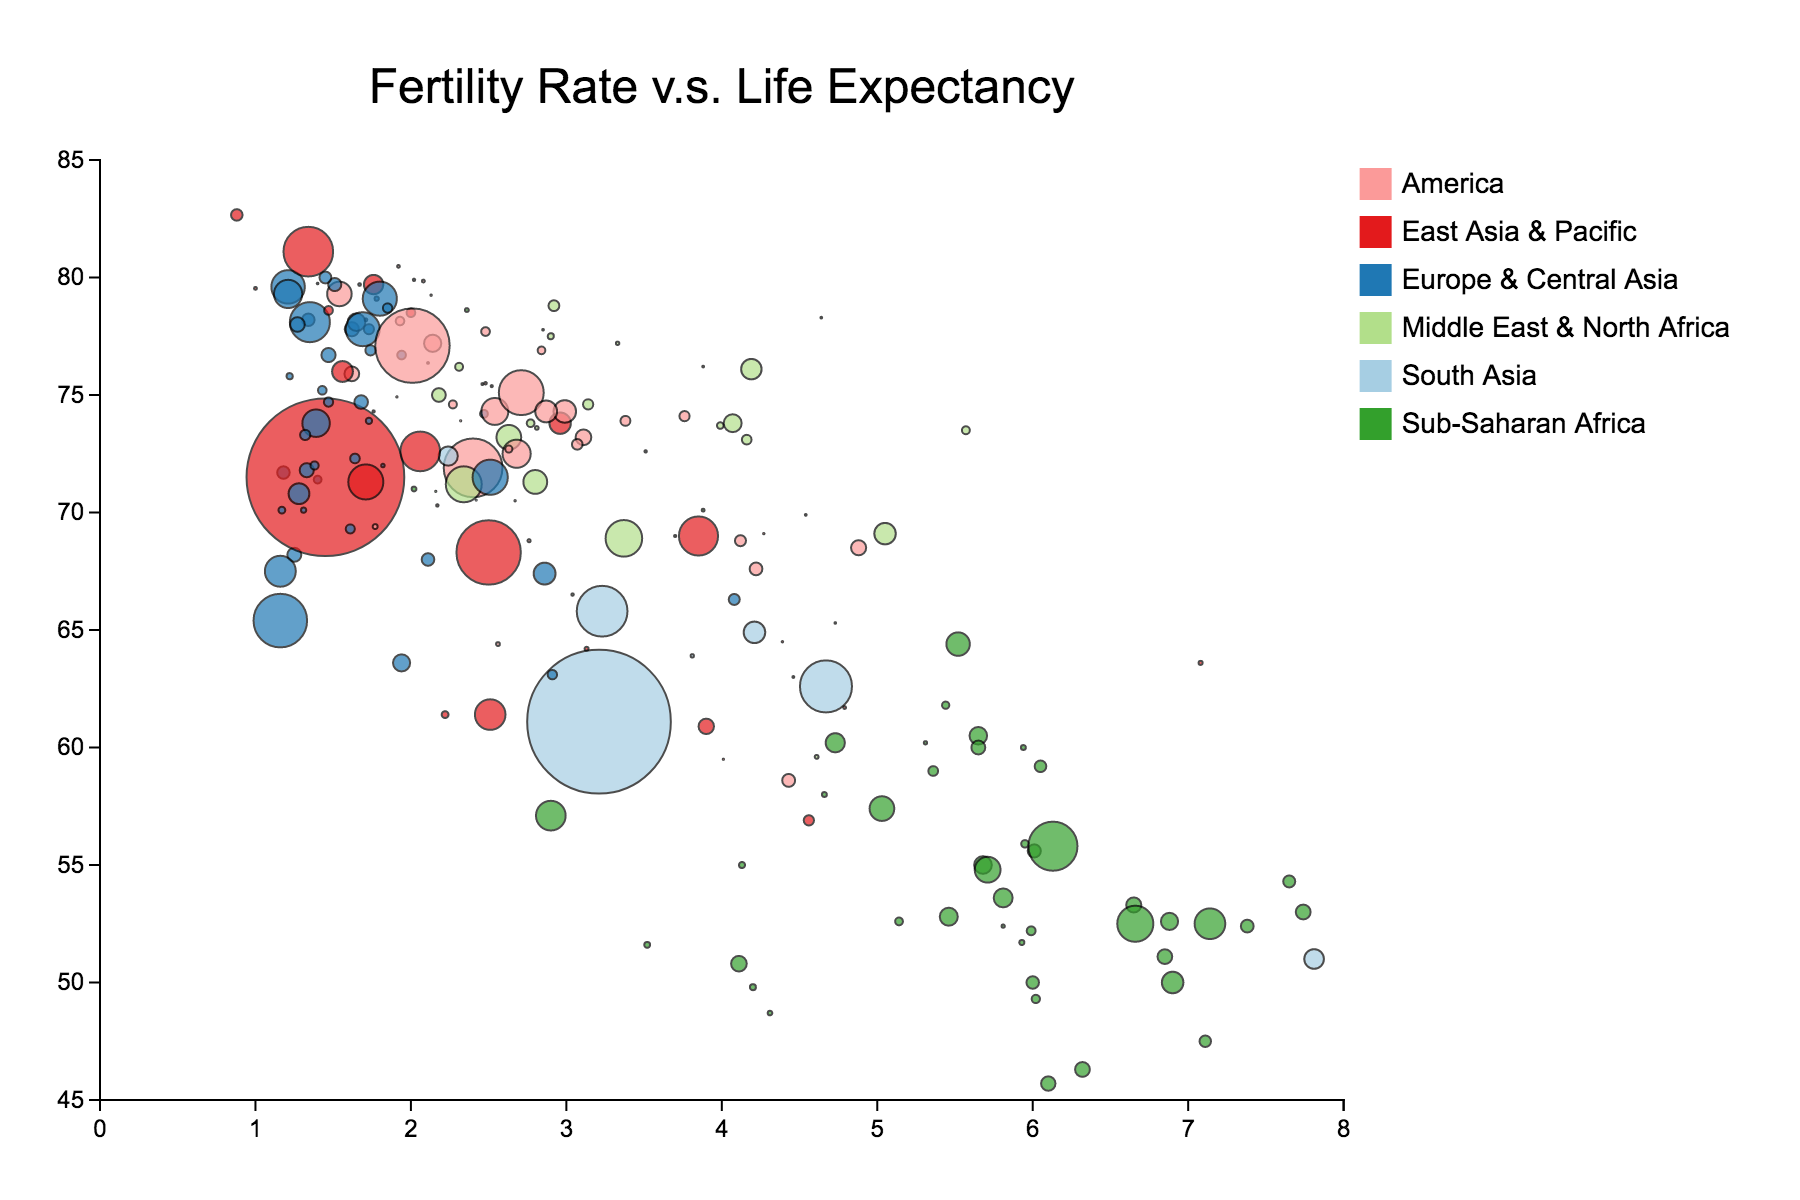 Fertility Rate vs. Life Expectancy